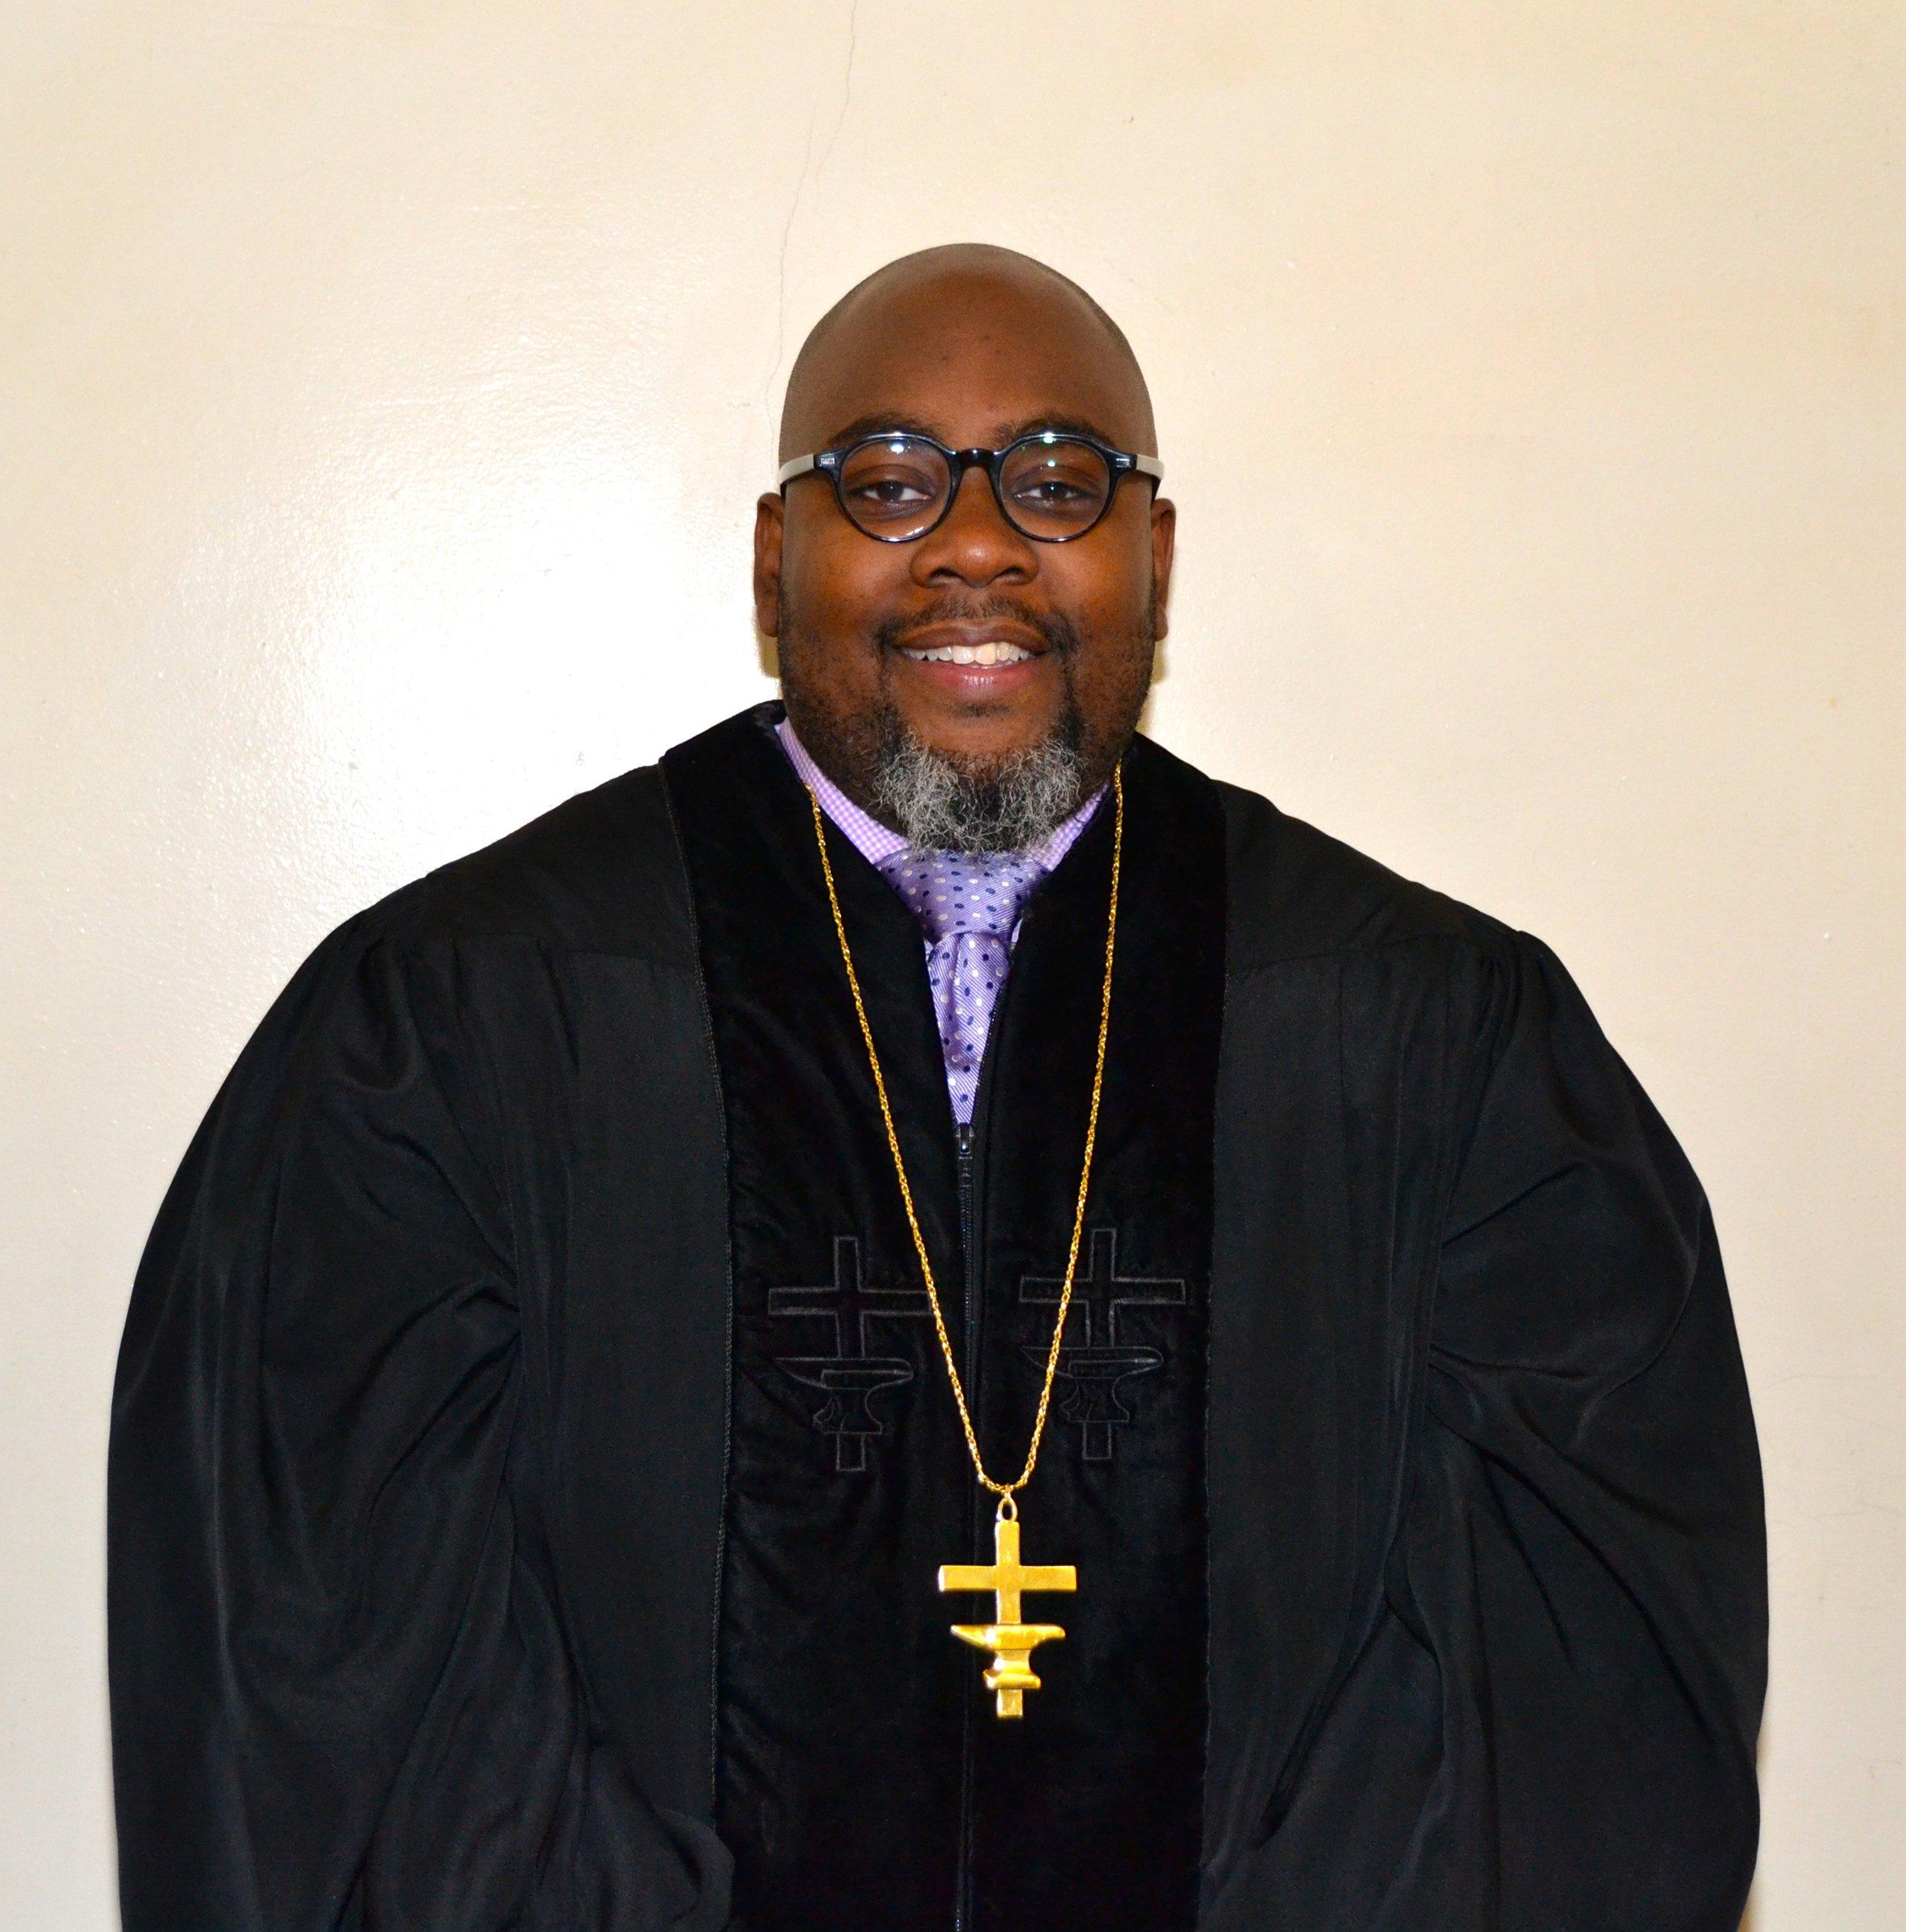 Rev. Dr. Stanley Hearst II